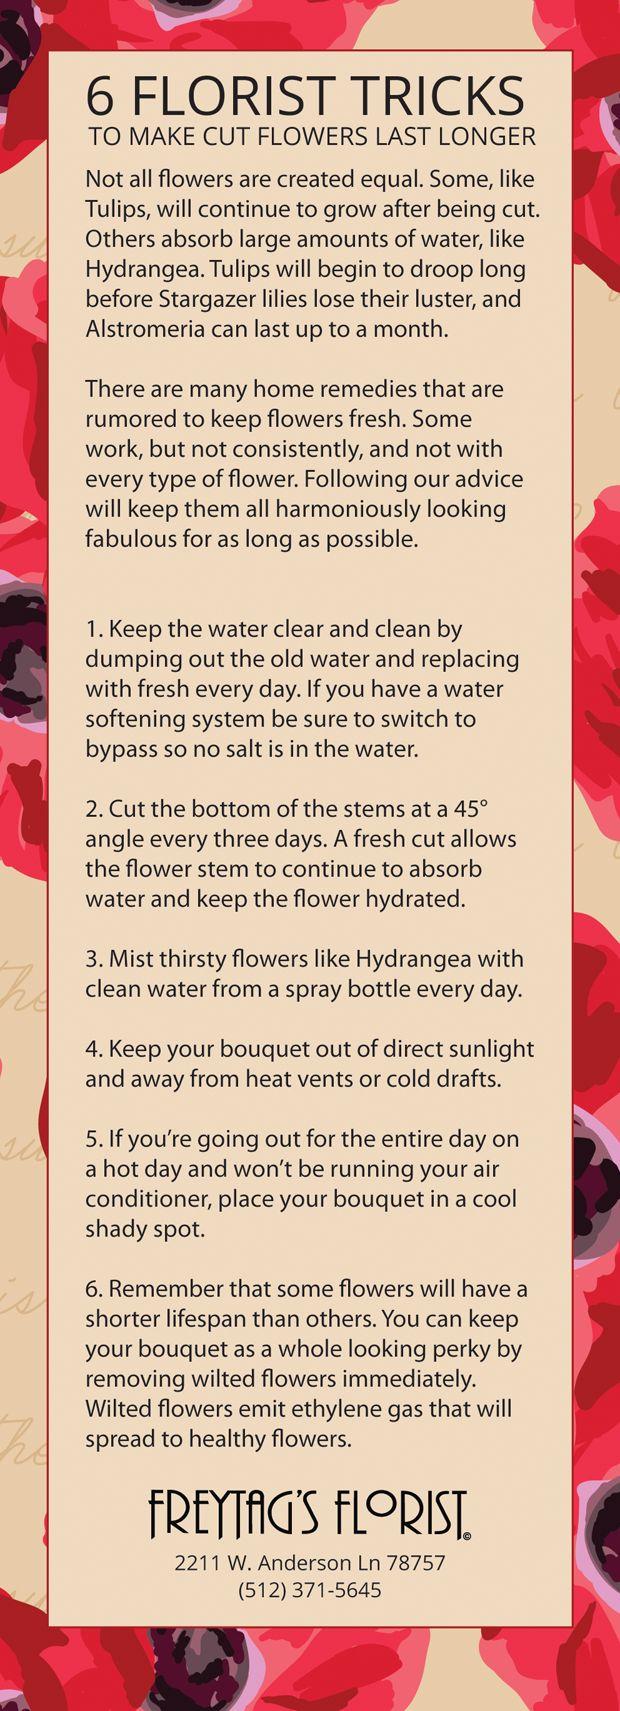 27 Best Pro Tips From A Florist Images On Pinterest Flower Shops